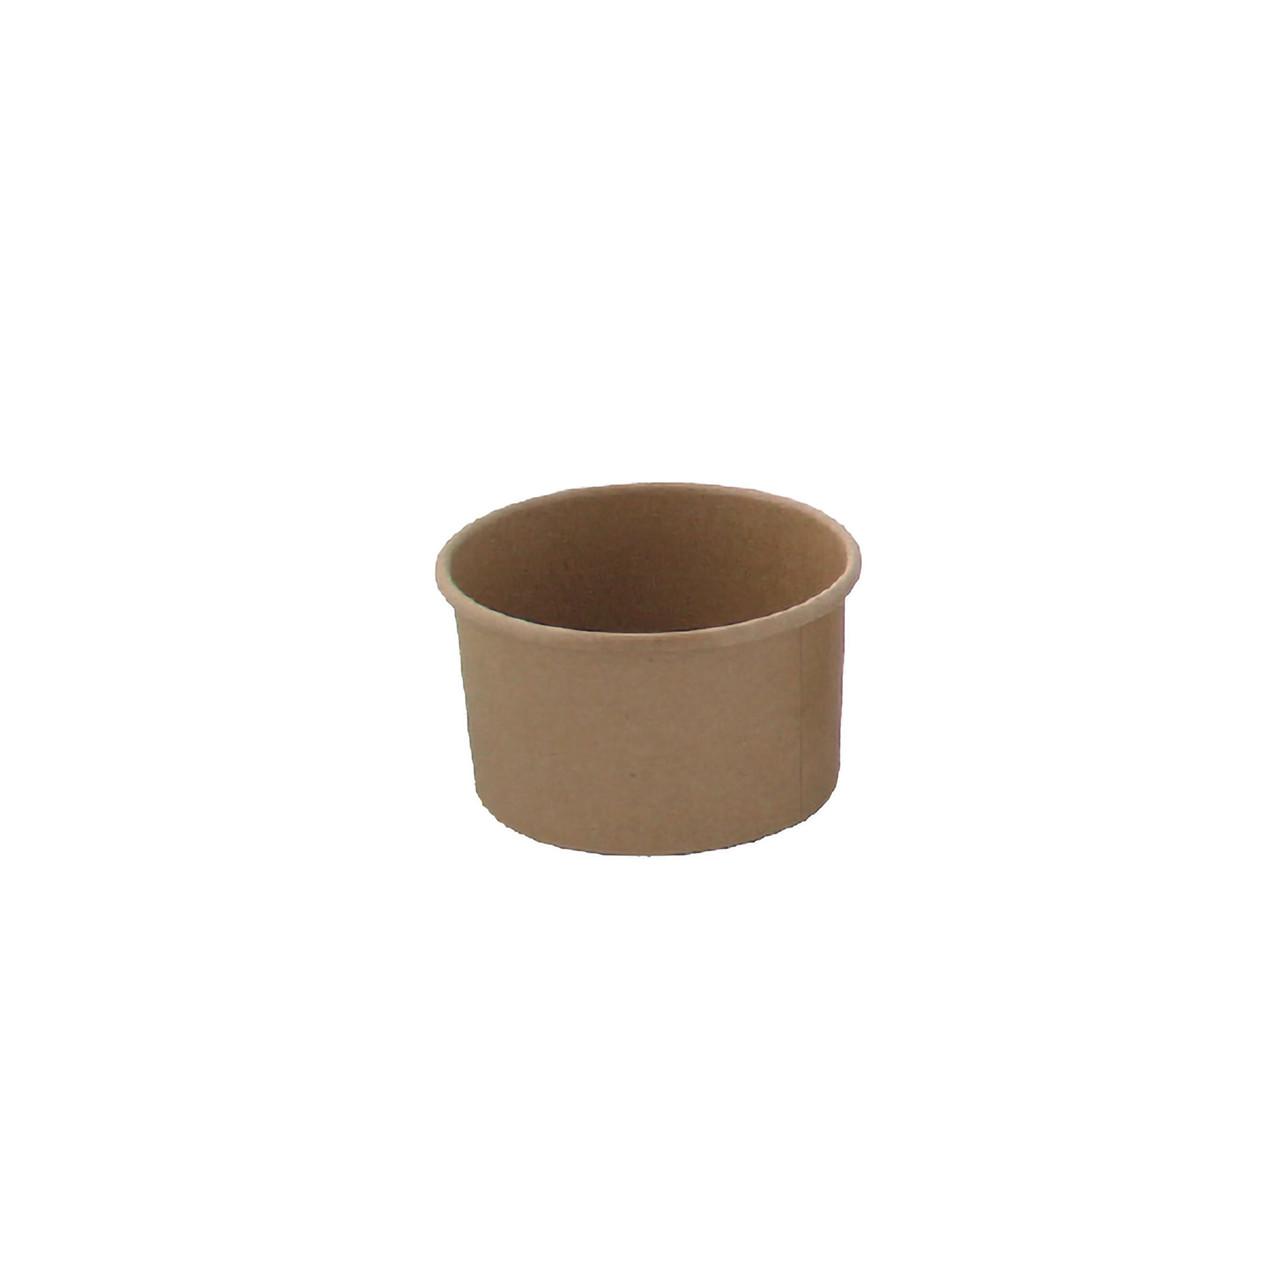 Brown Kraft Hot & Cold Paper Cup -7oz Dia:3.5in H:1.9in